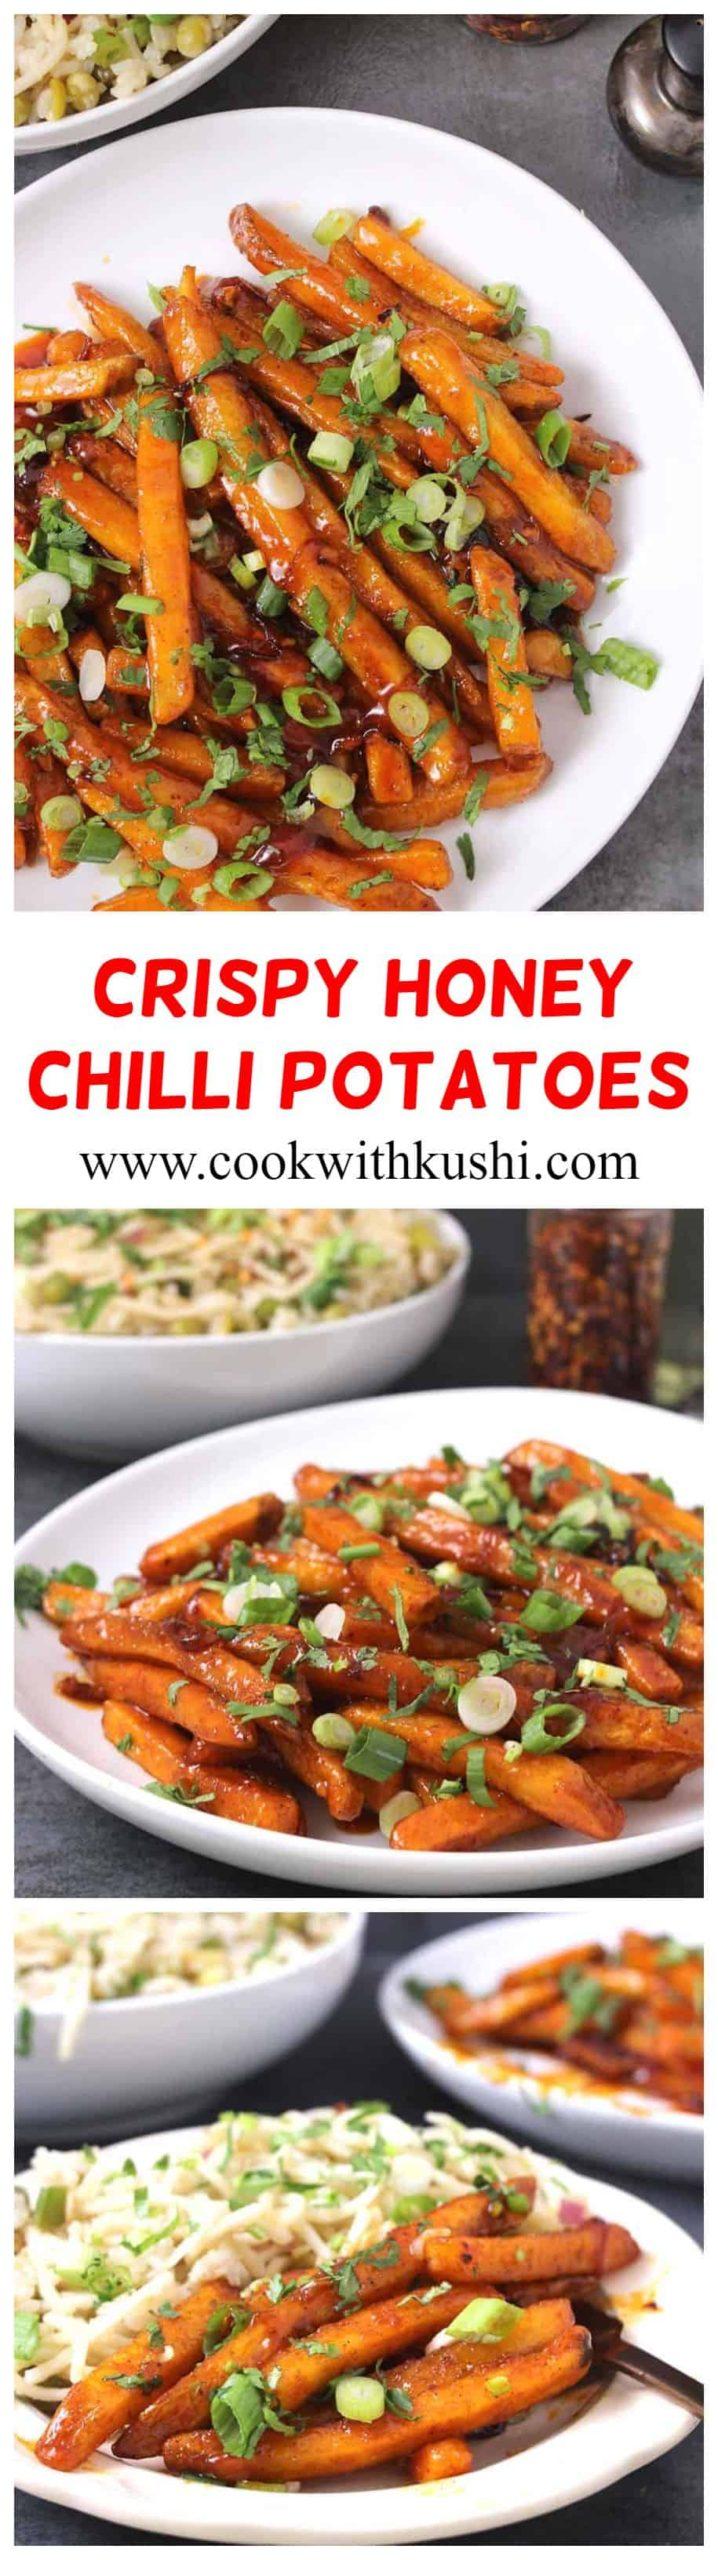 Crispy Honey Chilli Potatoes are irresistibly delicious, addictive sweet & spicy appetizer where the golden potatoes are glazed with fresh #honeychillisauce or #honeysrirachasauce. #superbowlfood #partyfoodideas #potatorecipes #potatosides #potatoappetizers